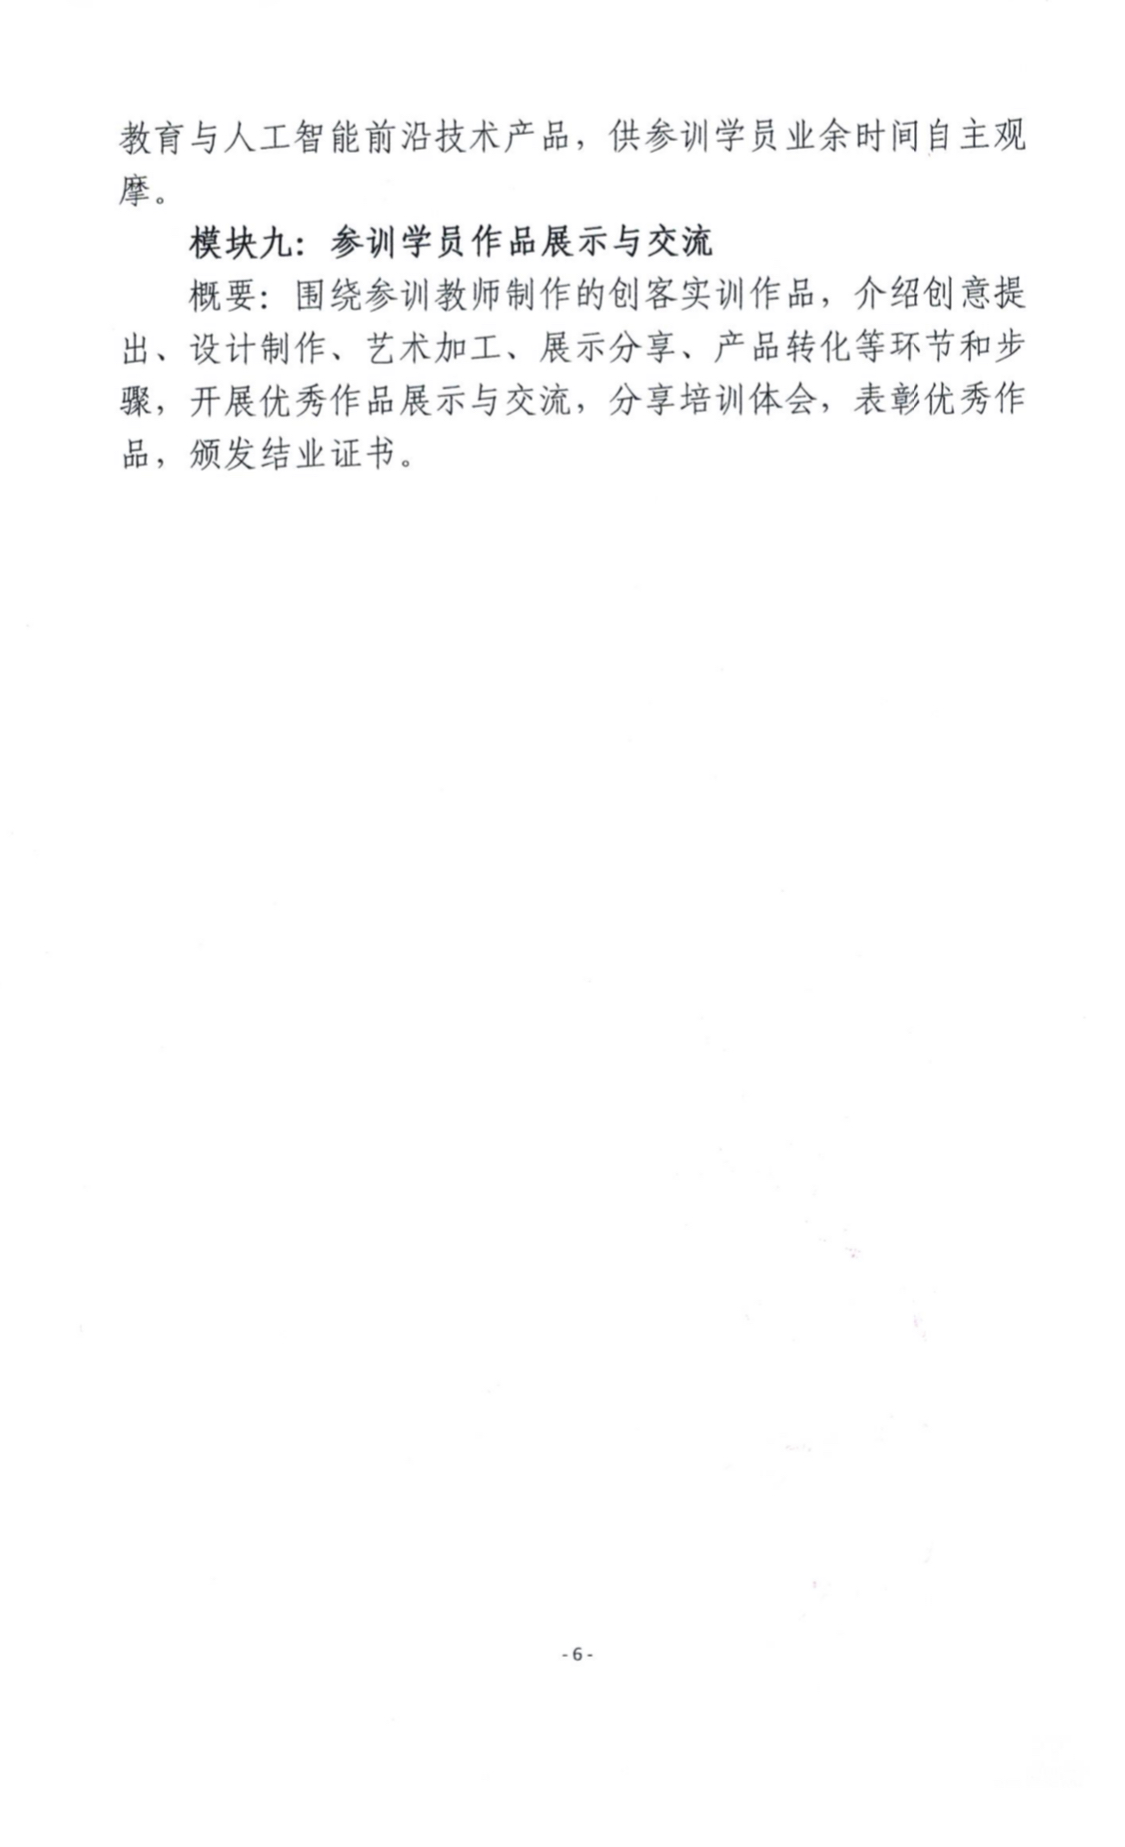 IMG_5345(20190522-185242)